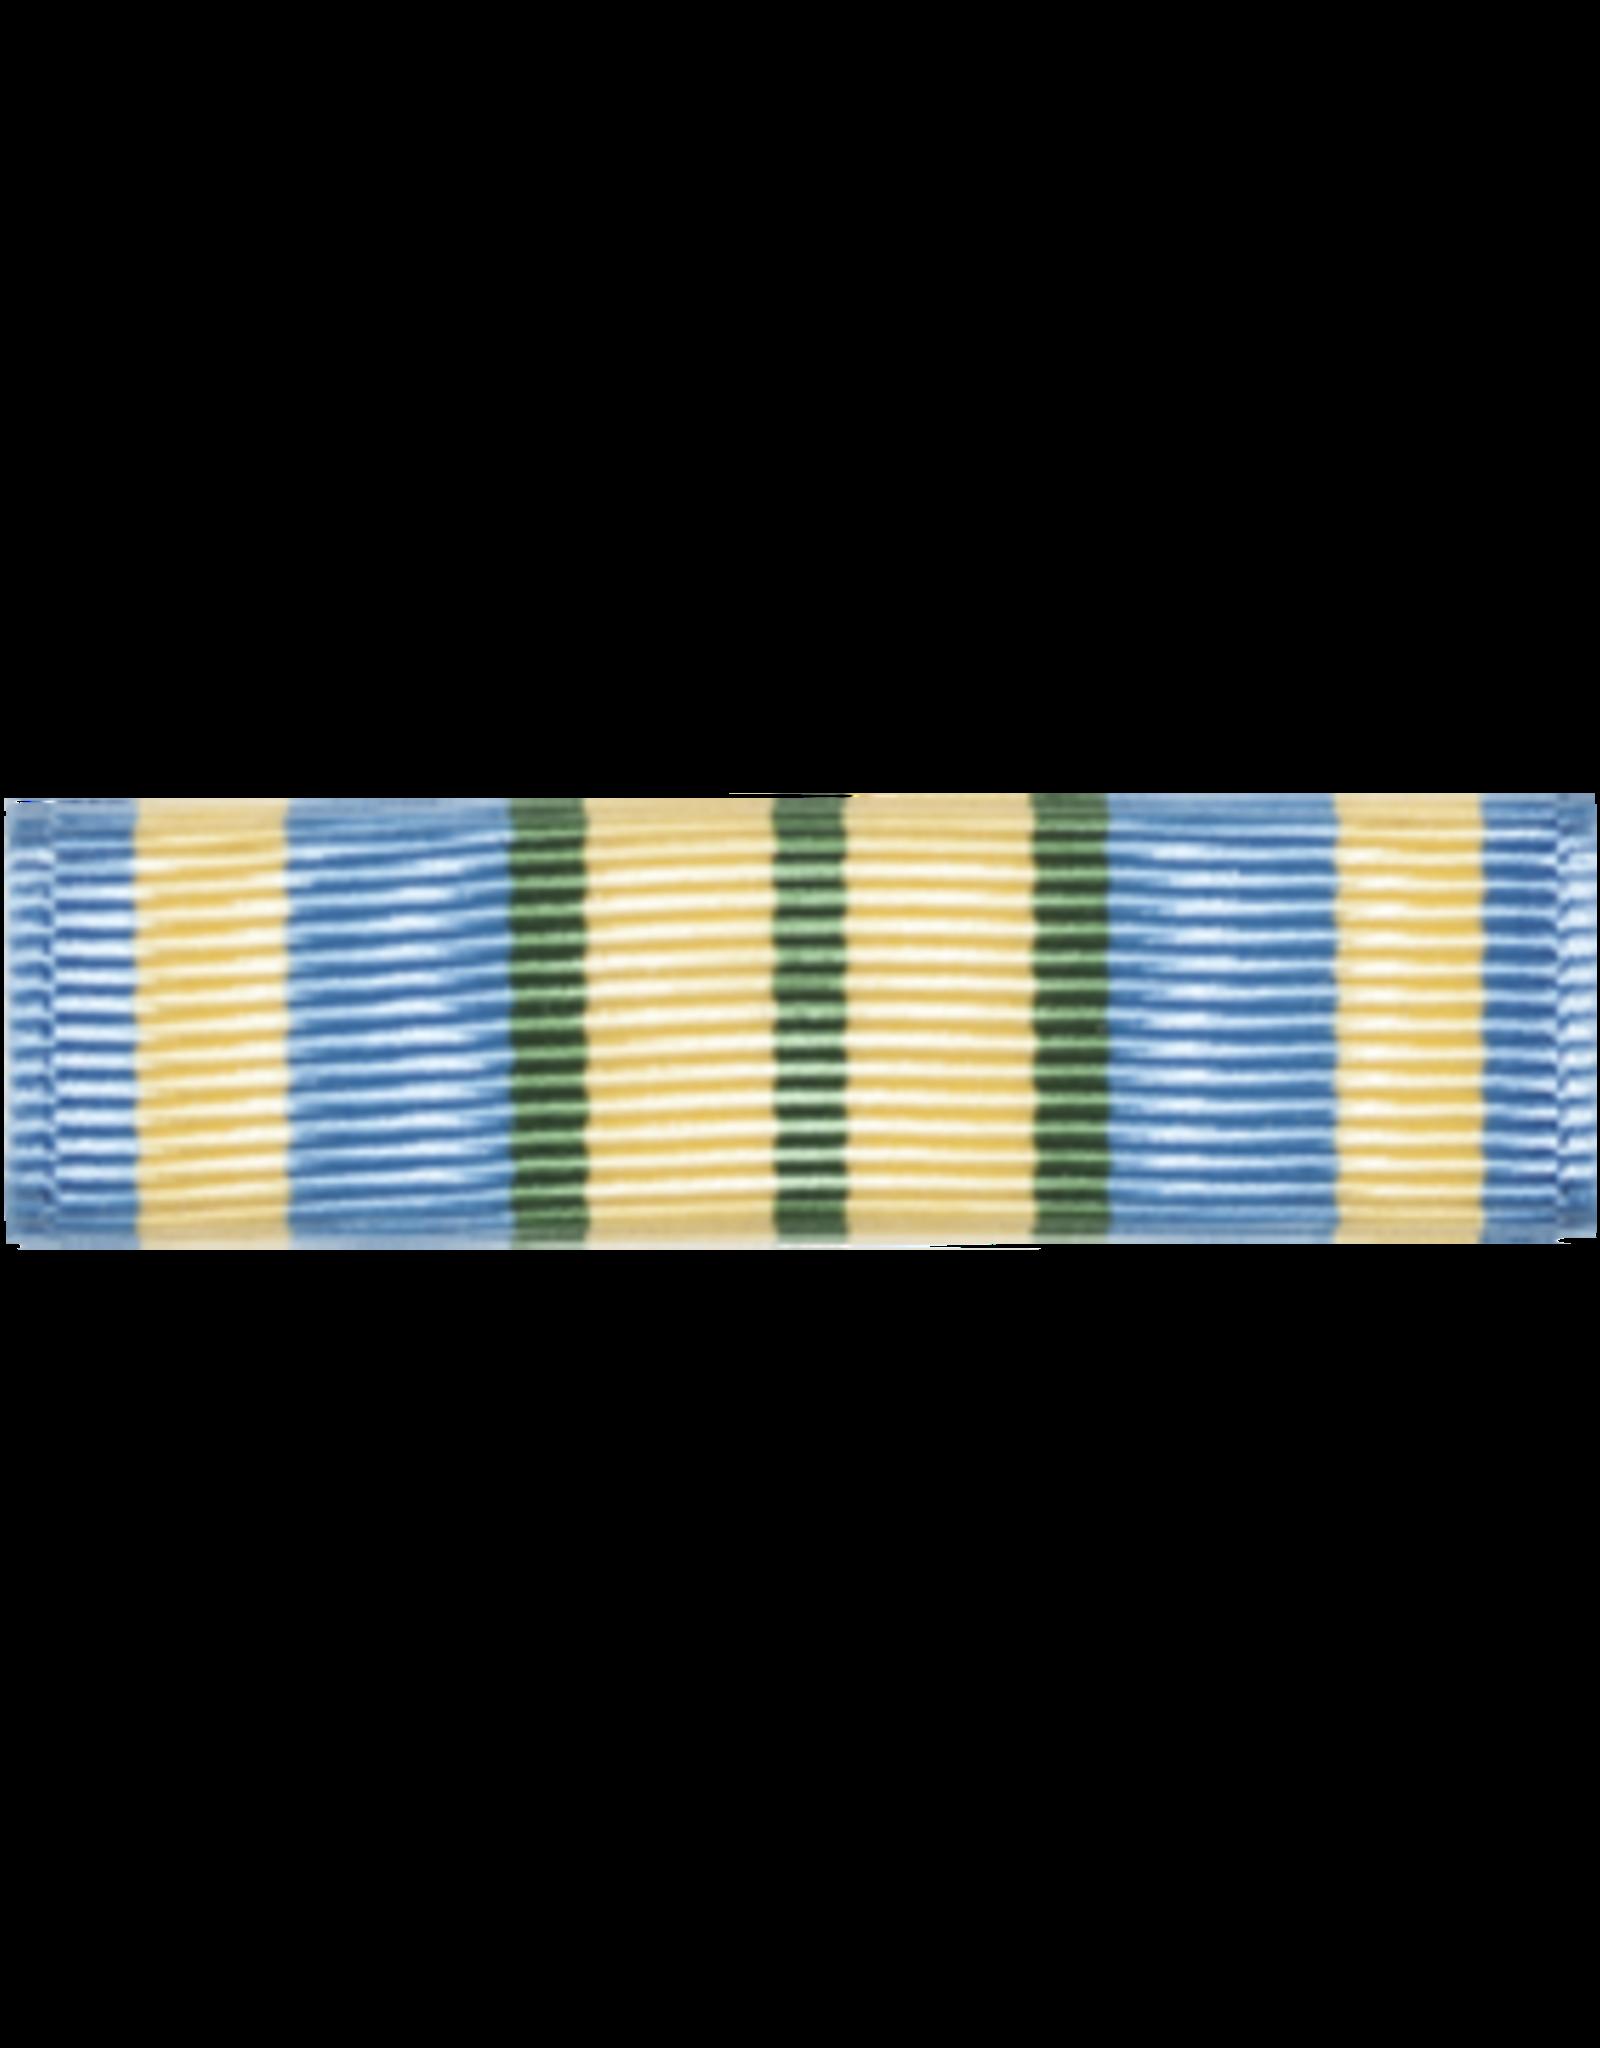 Ribbon - Outstanding Volunteer Service